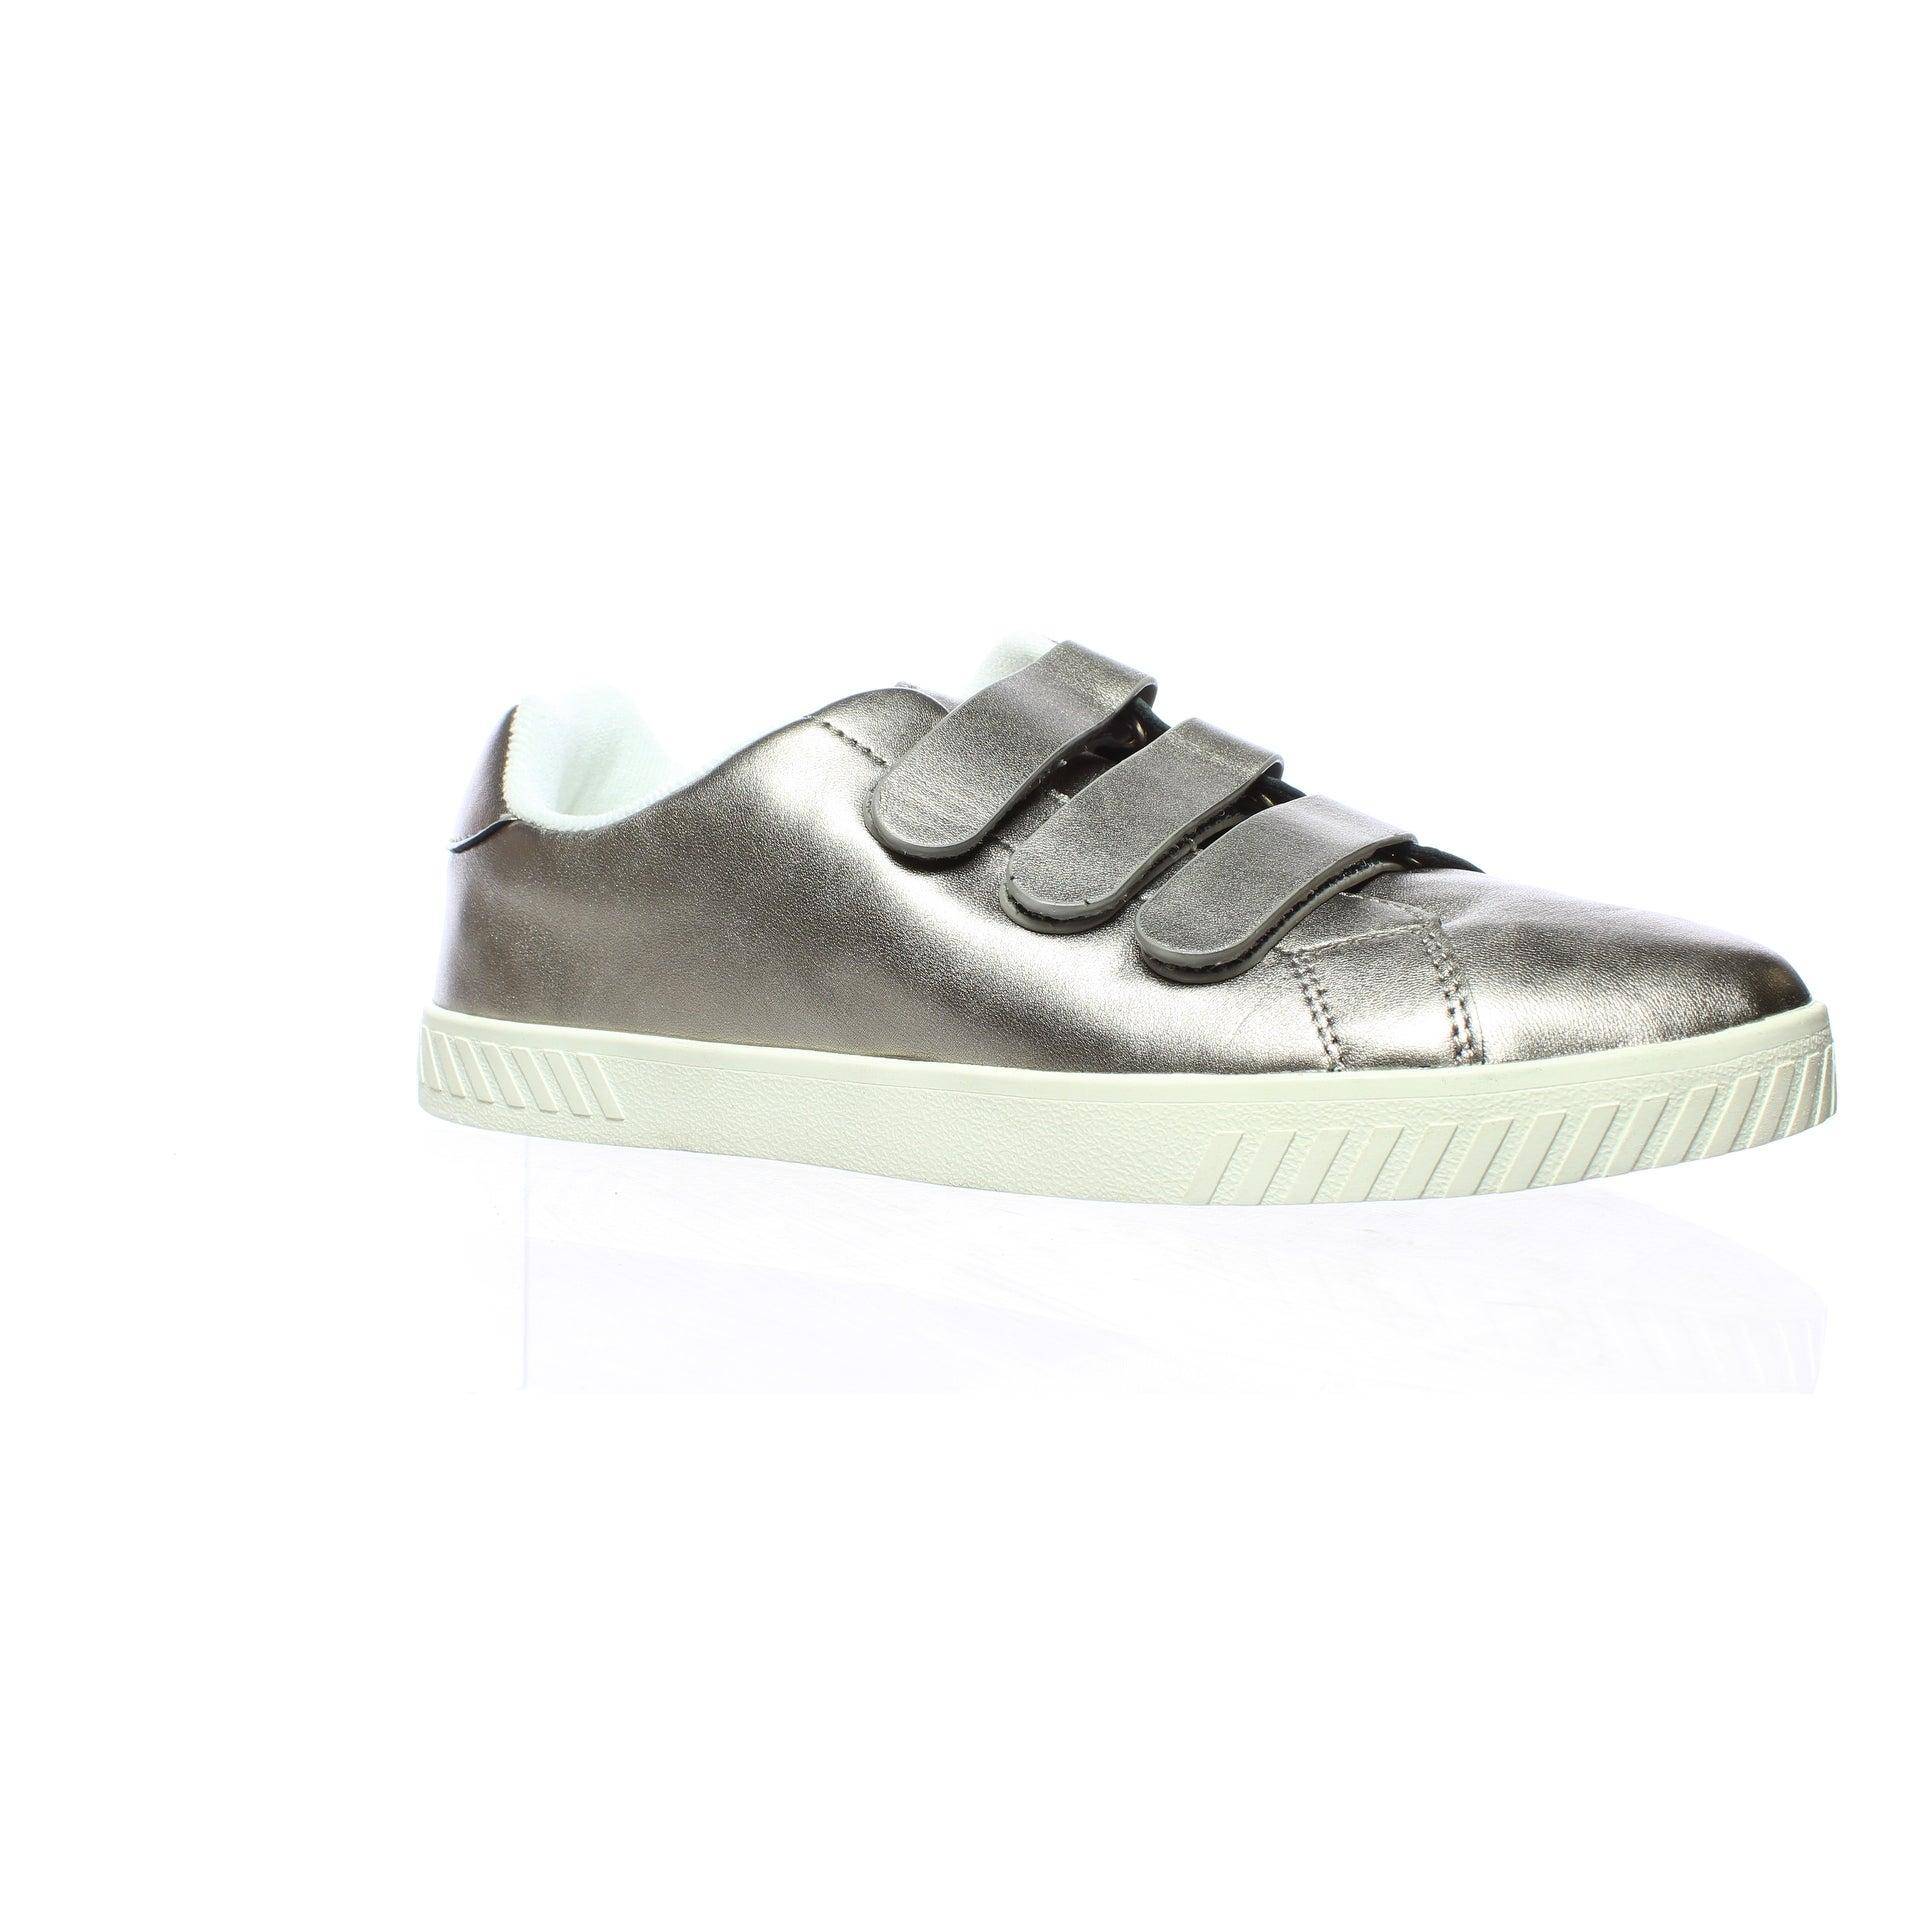 bc28cbe945cdb Tretorn Womens Carry2 Grey Suede Fashion Sneaker Size 10